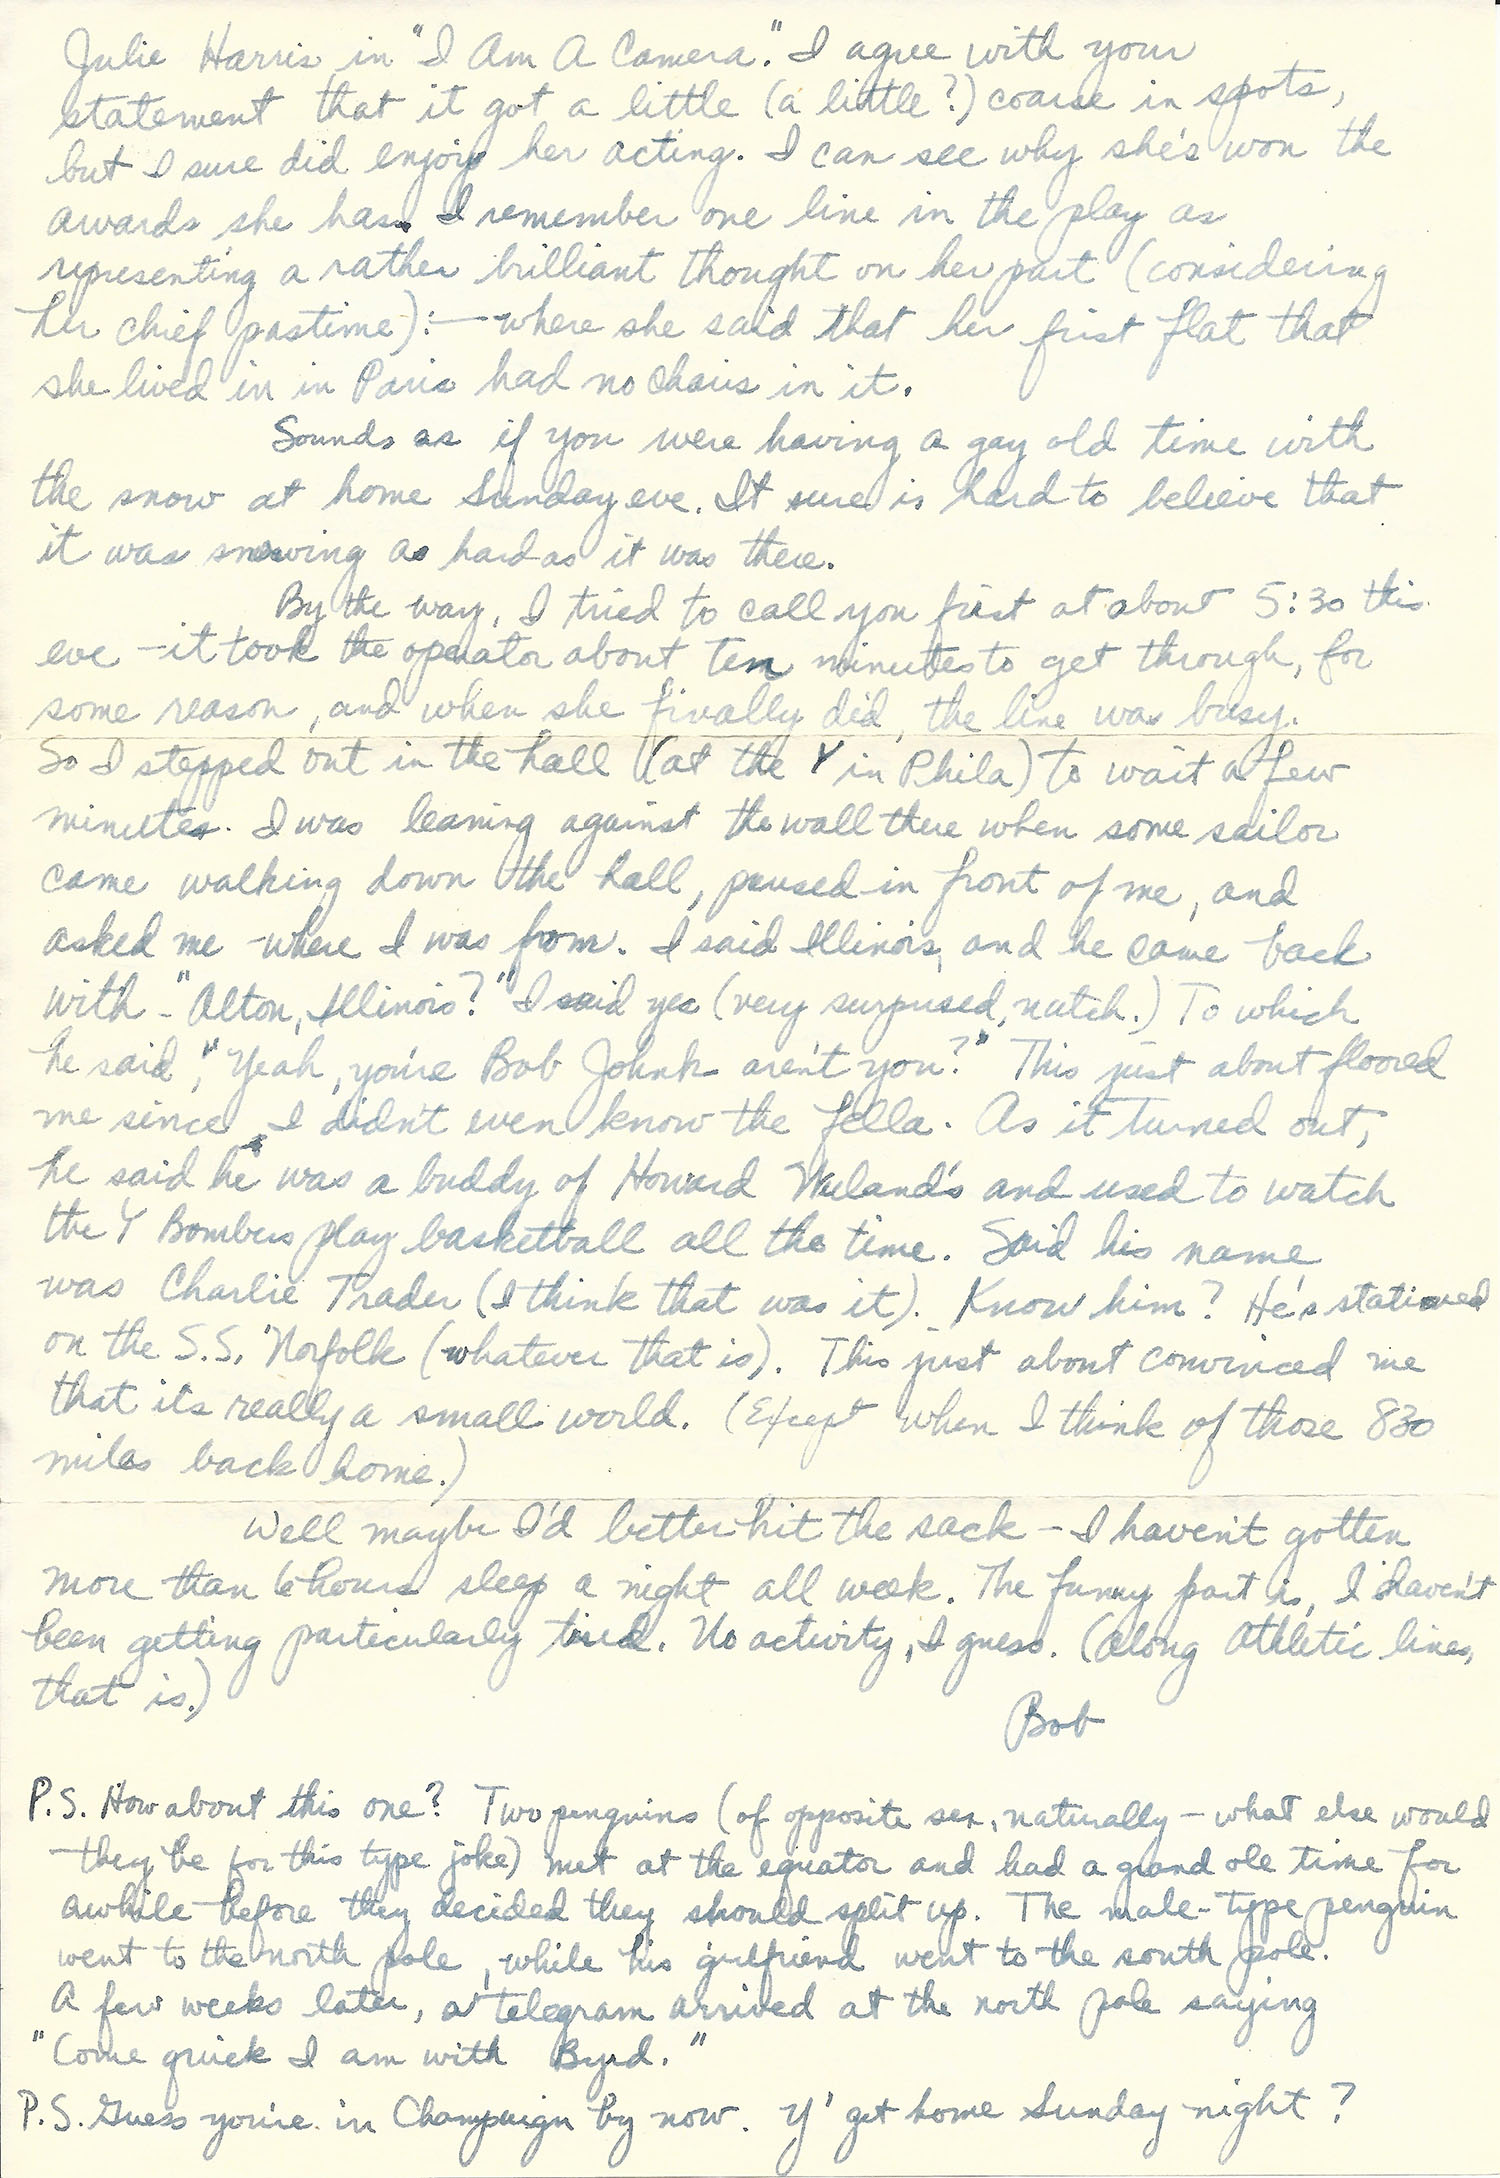 Mar. 1, 1953 (Bob) Page 2